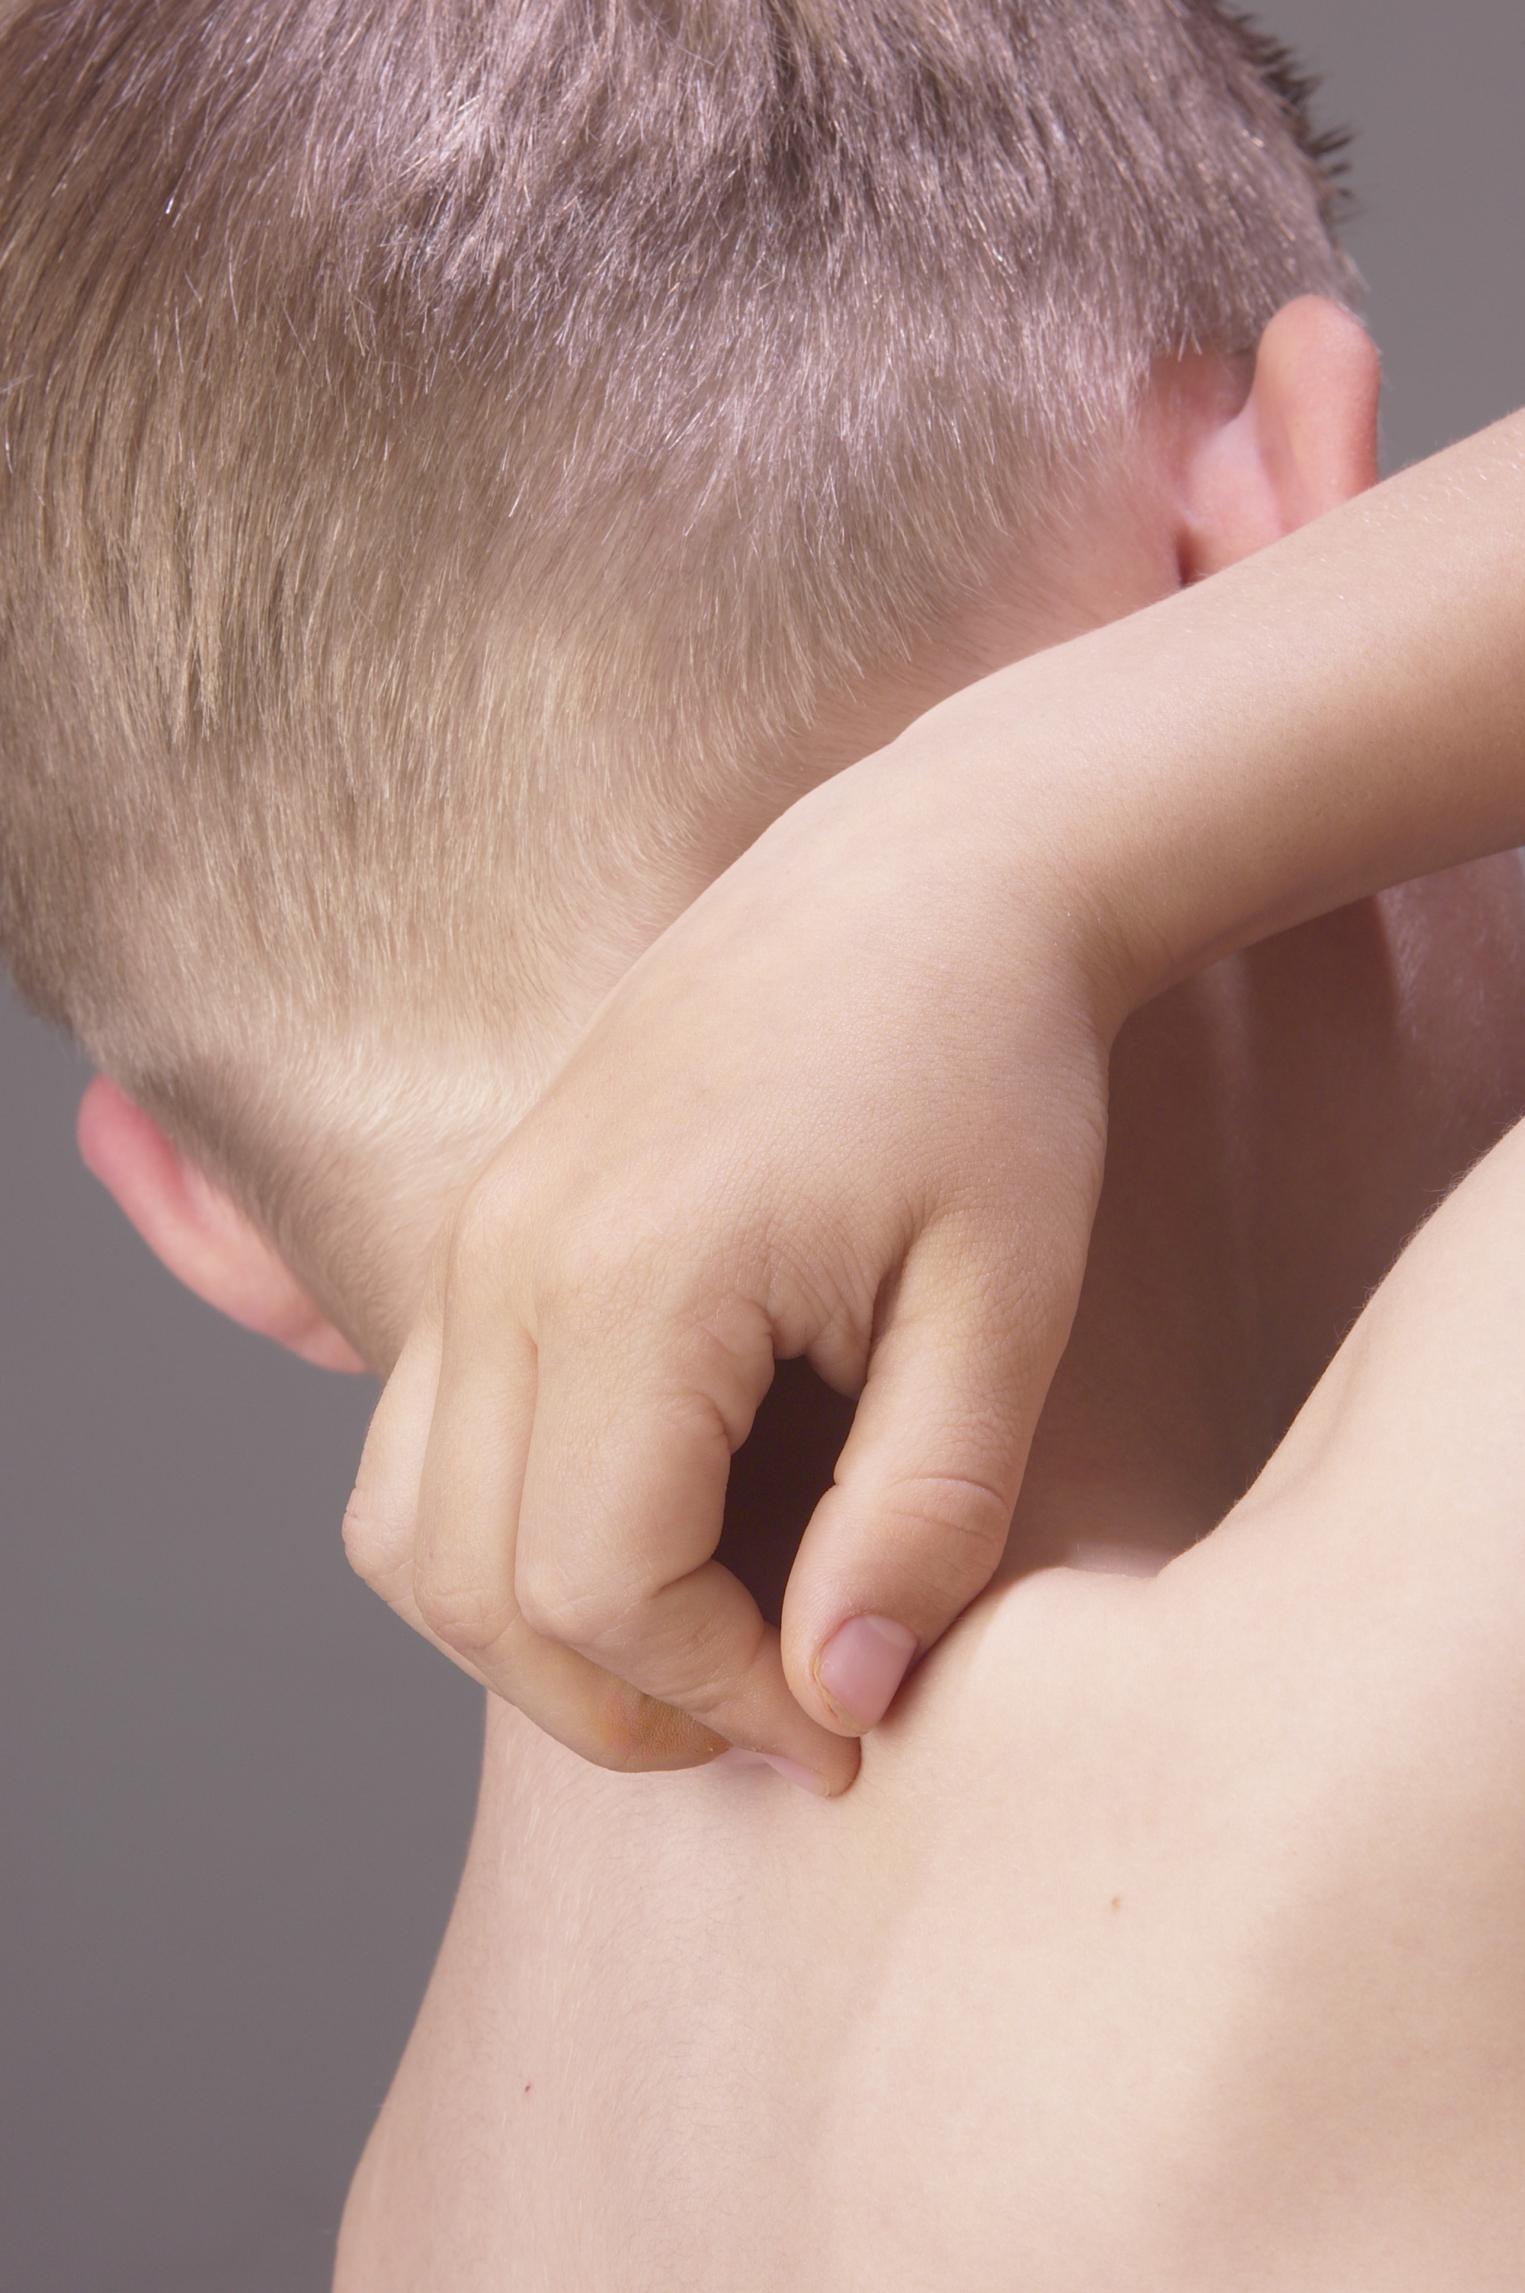 Dry Itchy Skin All Over Body No Rash | Diydrywalls org